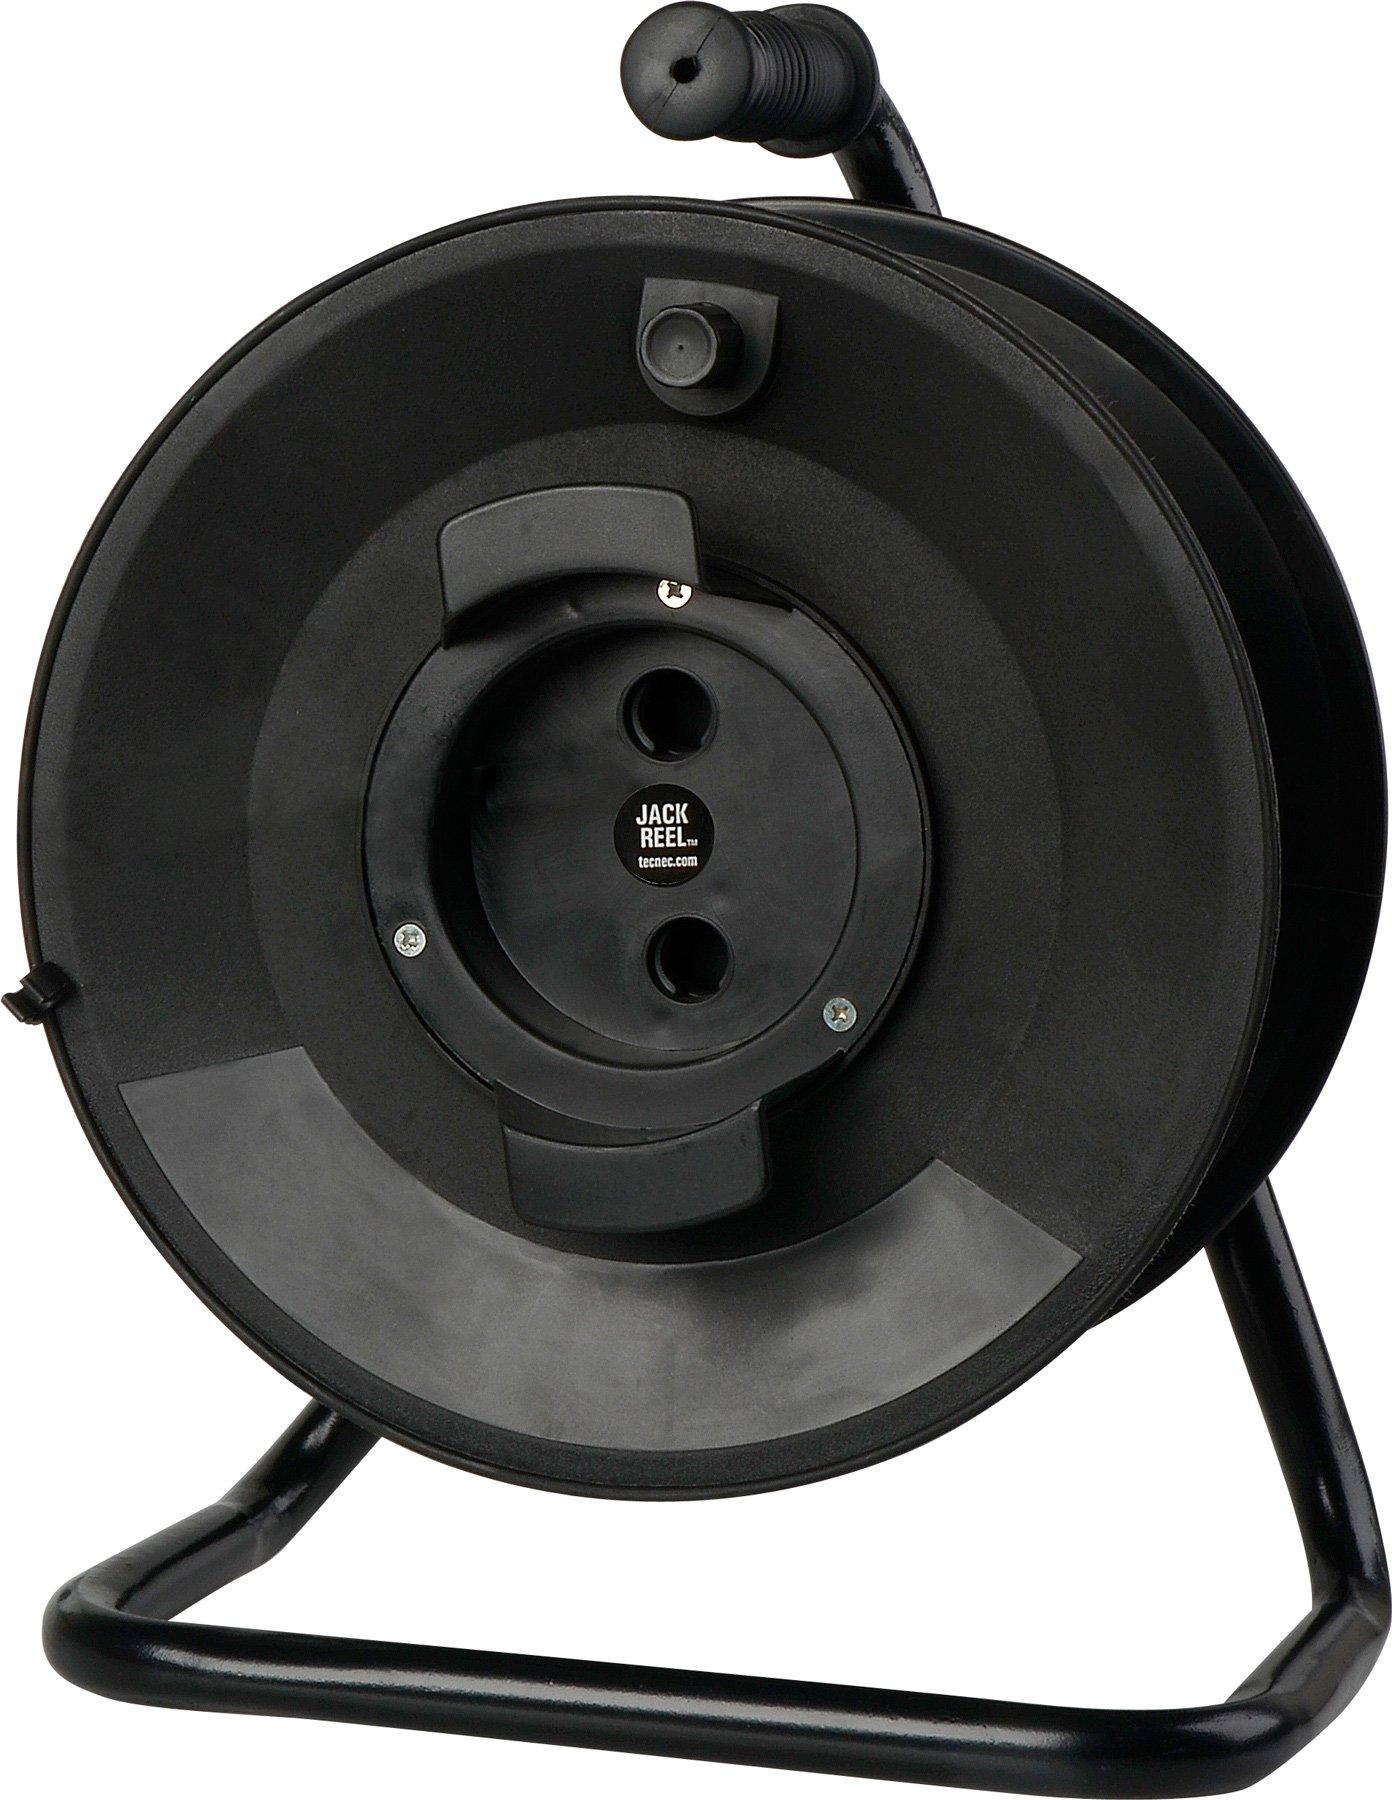 TecNec JackReel-3 High Capacity Low Cost Cable Reel JACKREEL-3